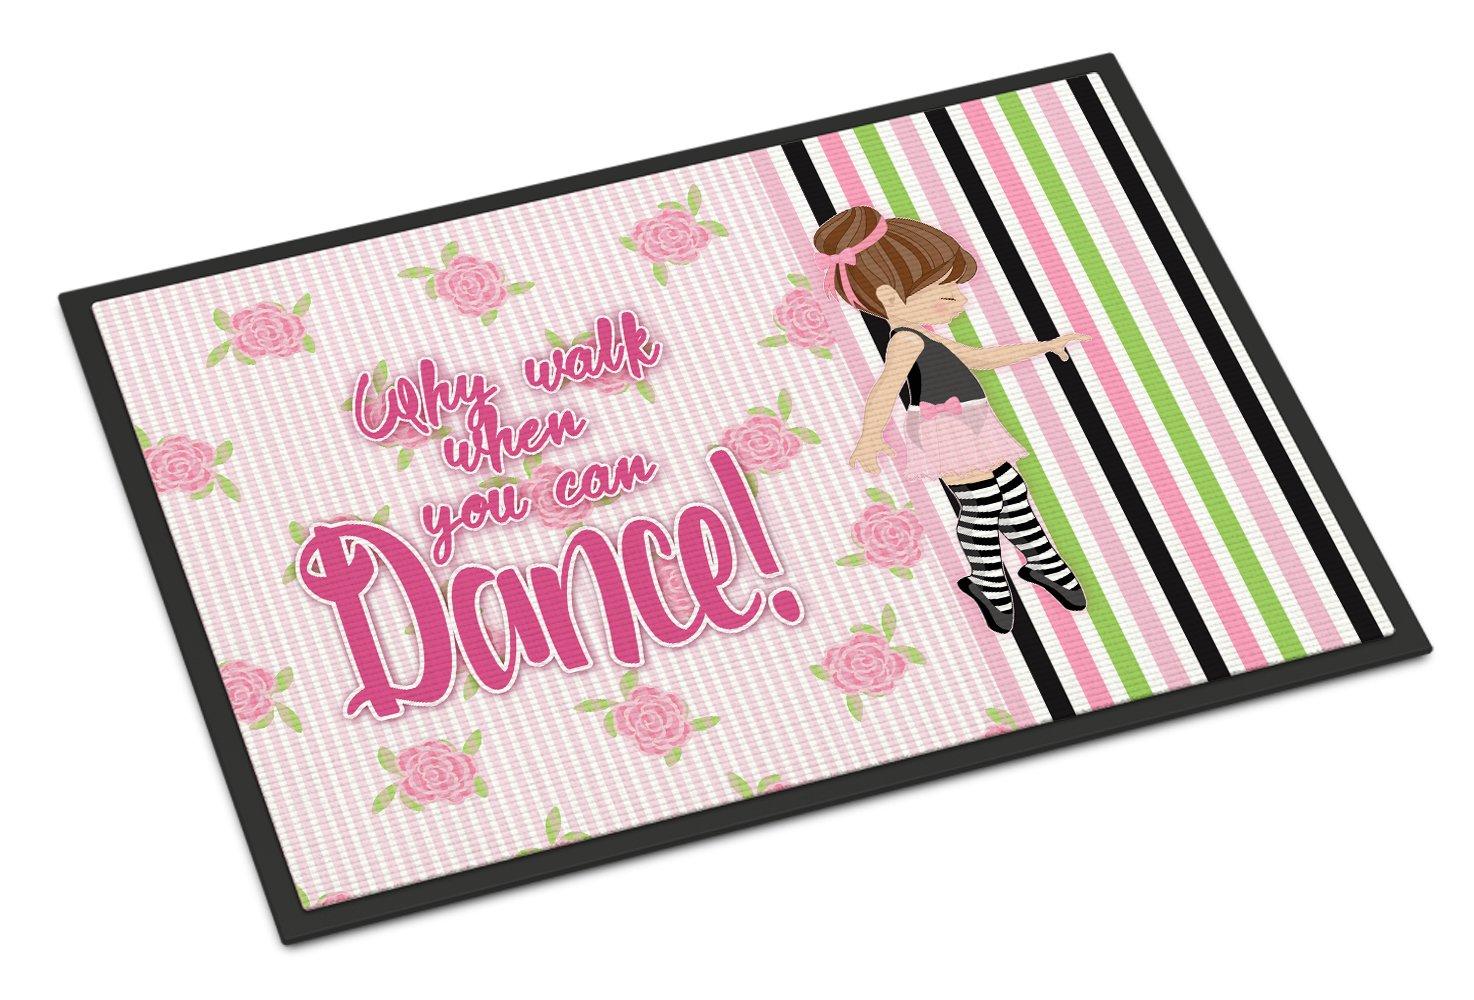 Caroline's Treasures Ballet Dance Stripes Brunette Doormat, 24 H x 36 W'', Multicolor